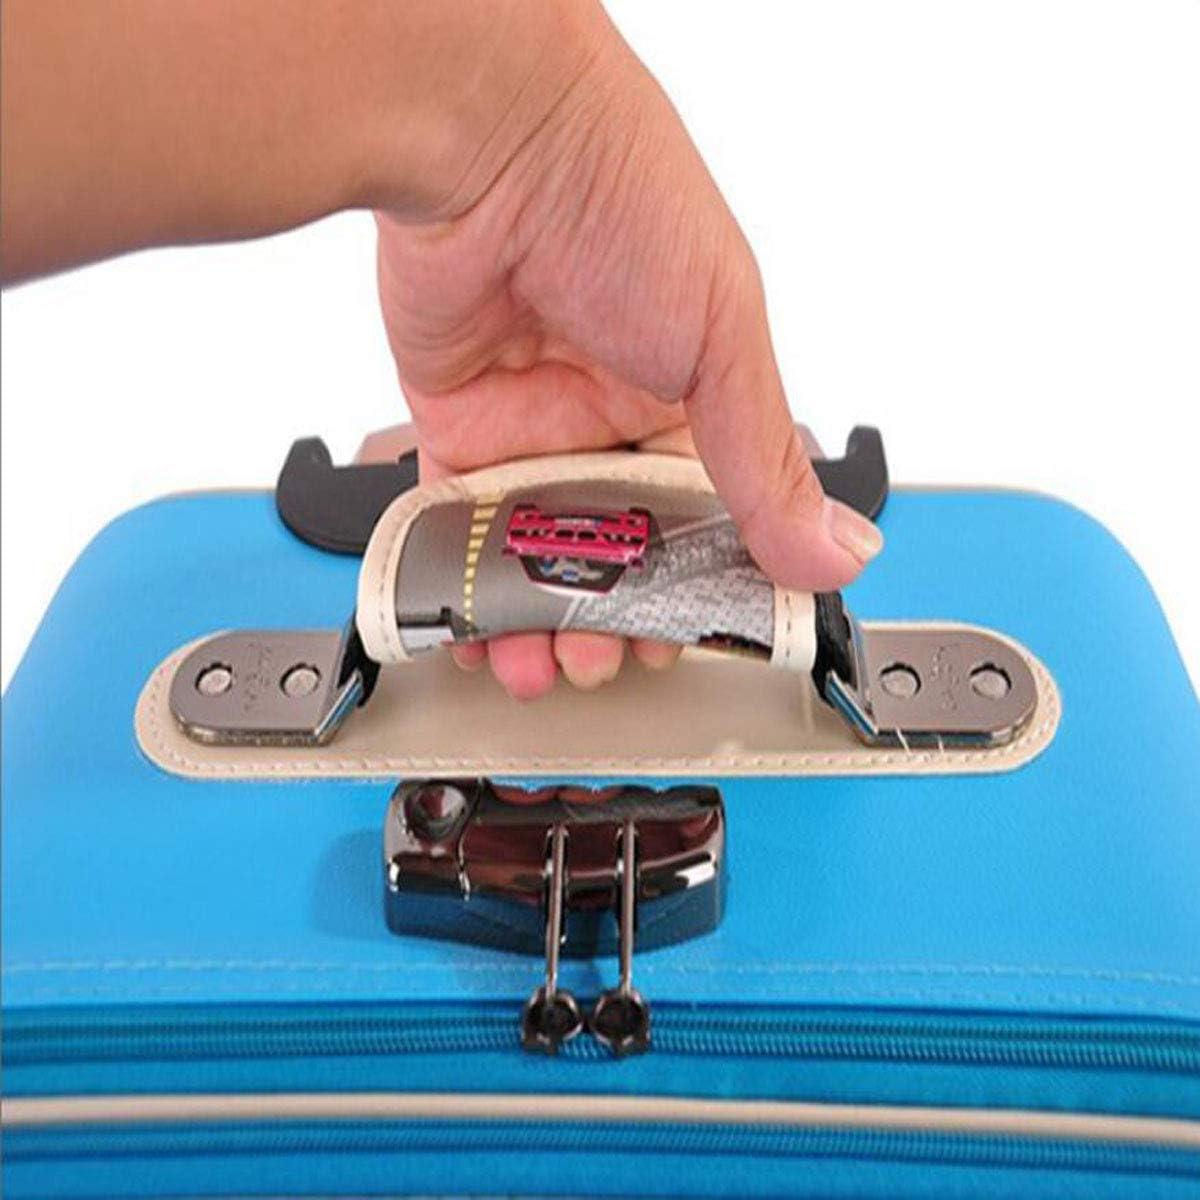 Aishanghuayi Suitcase for Portable and Expandable Business suitcases cm 35 23 57 Color : Khaki, Size : 161127 inch Size Blue